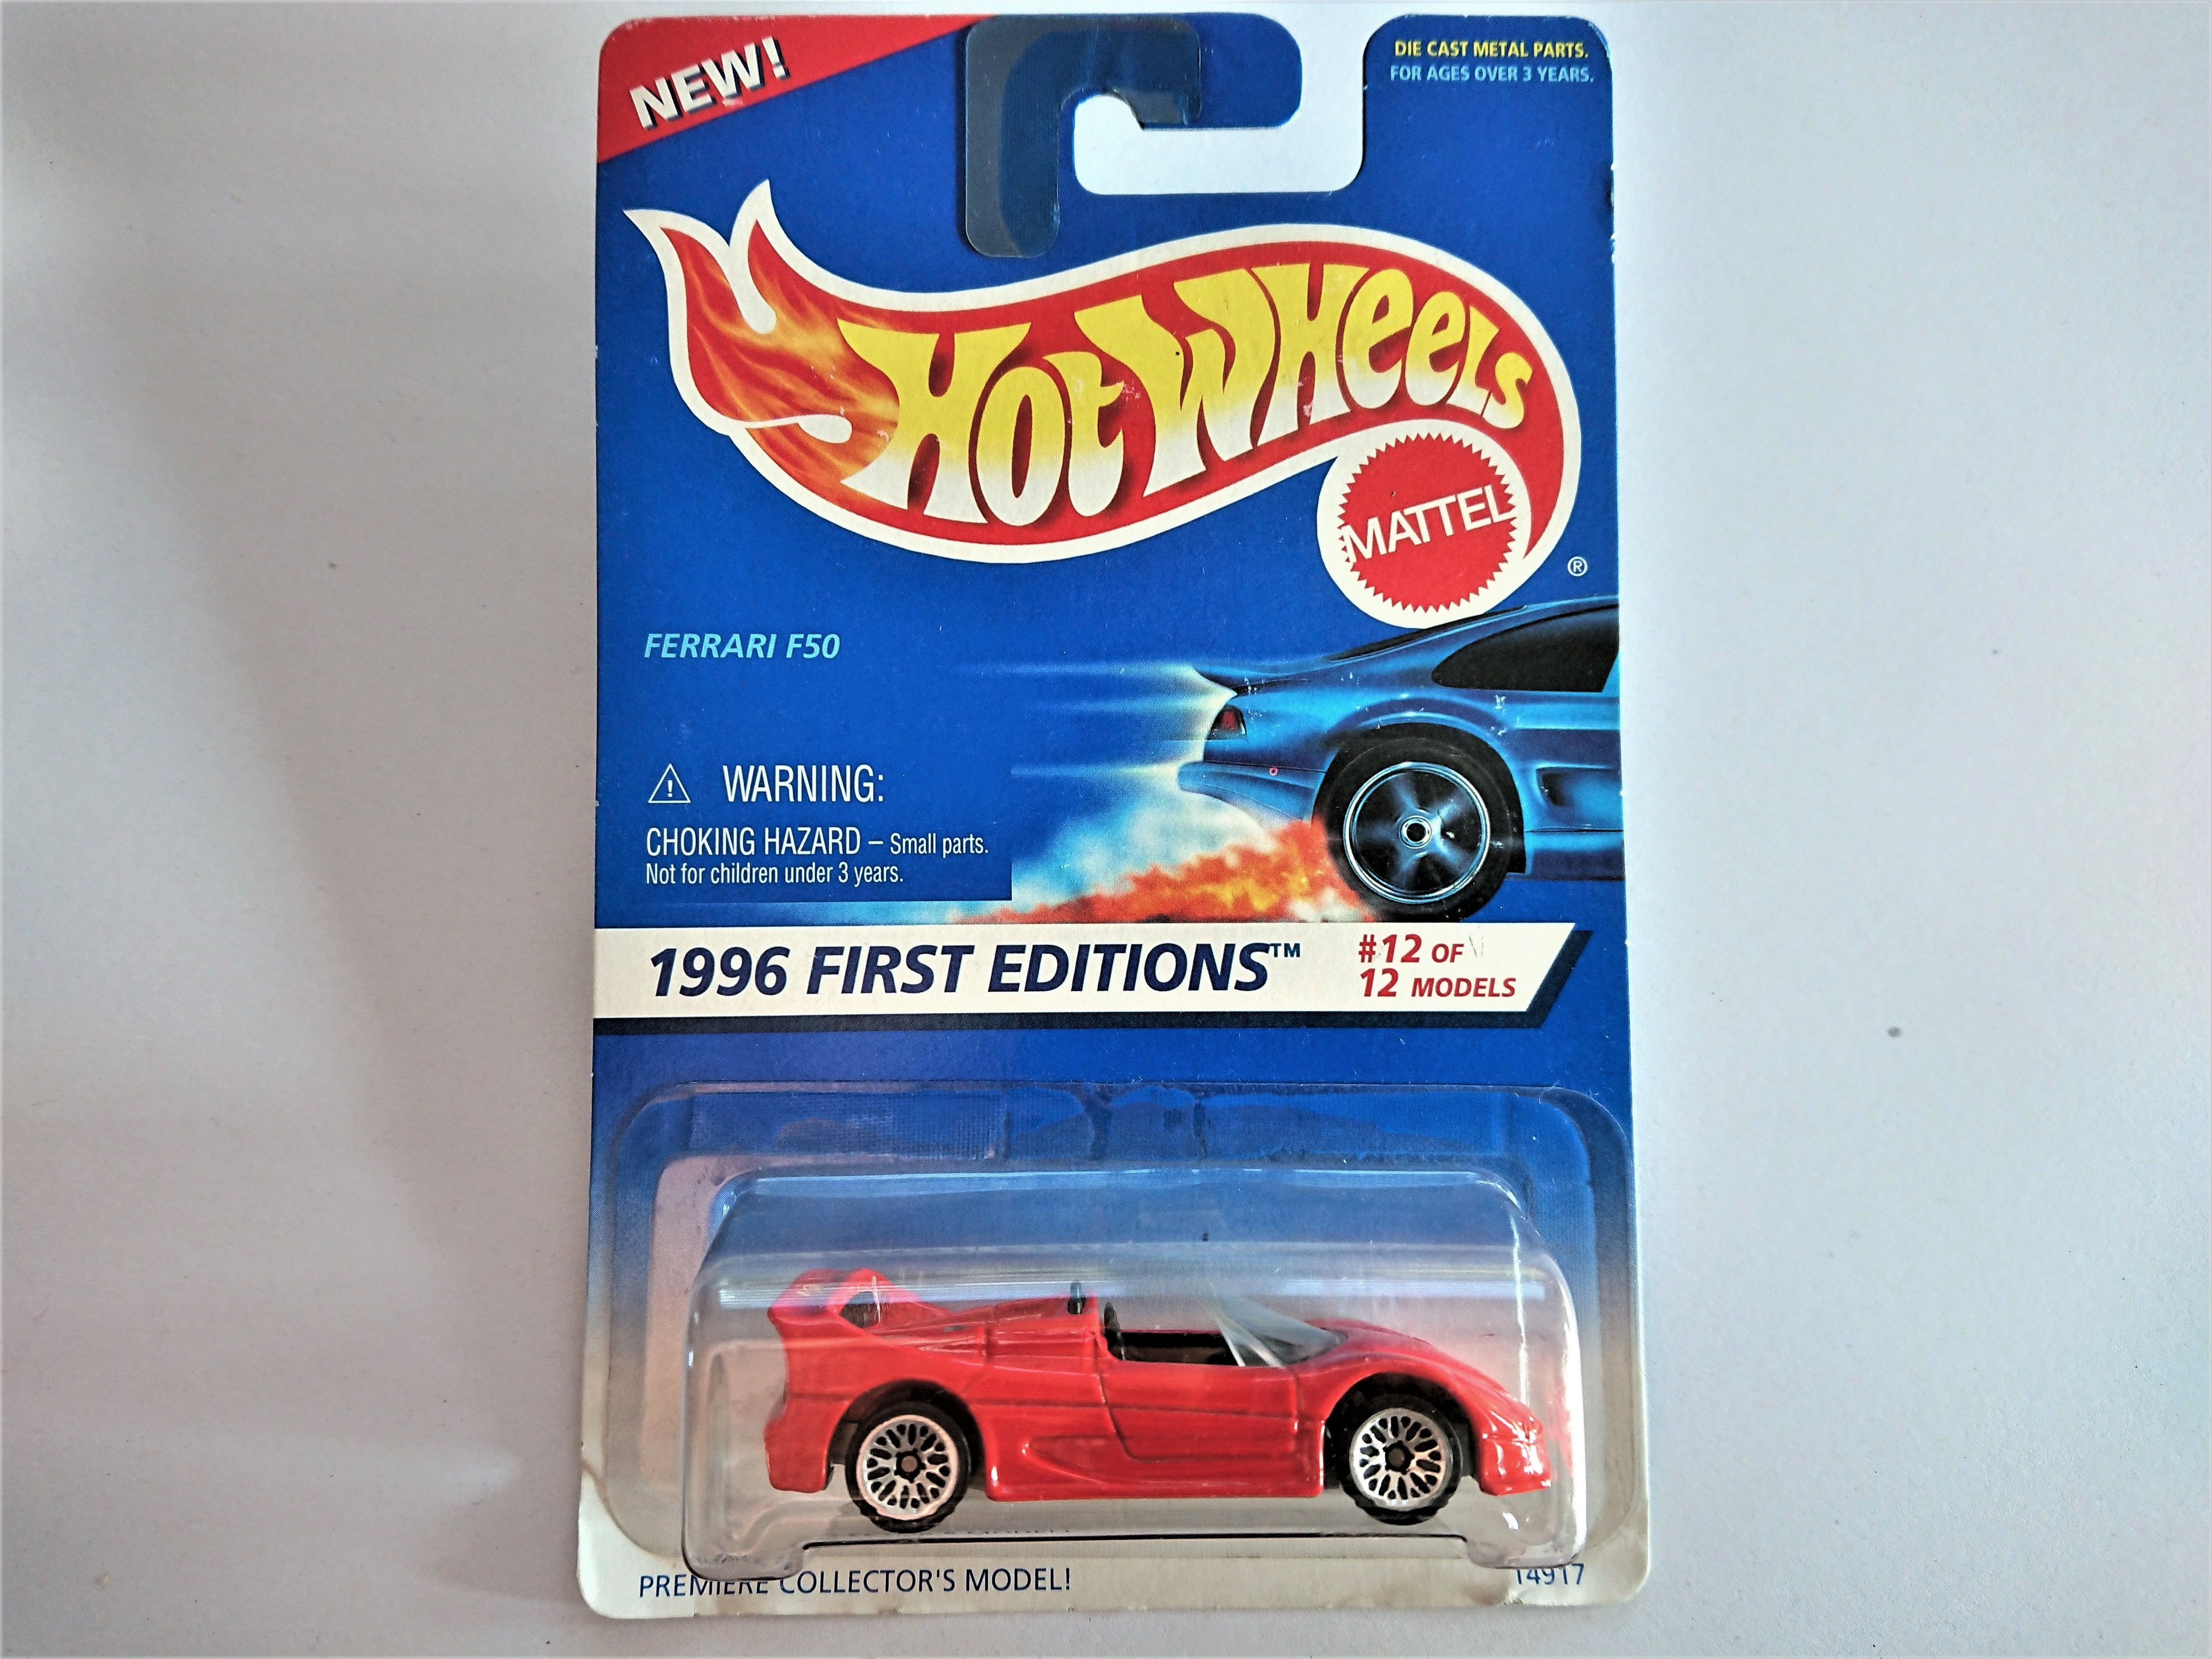 1996 Ferrari F50 Hot Wheels Hot Wheels Hot Sammlung